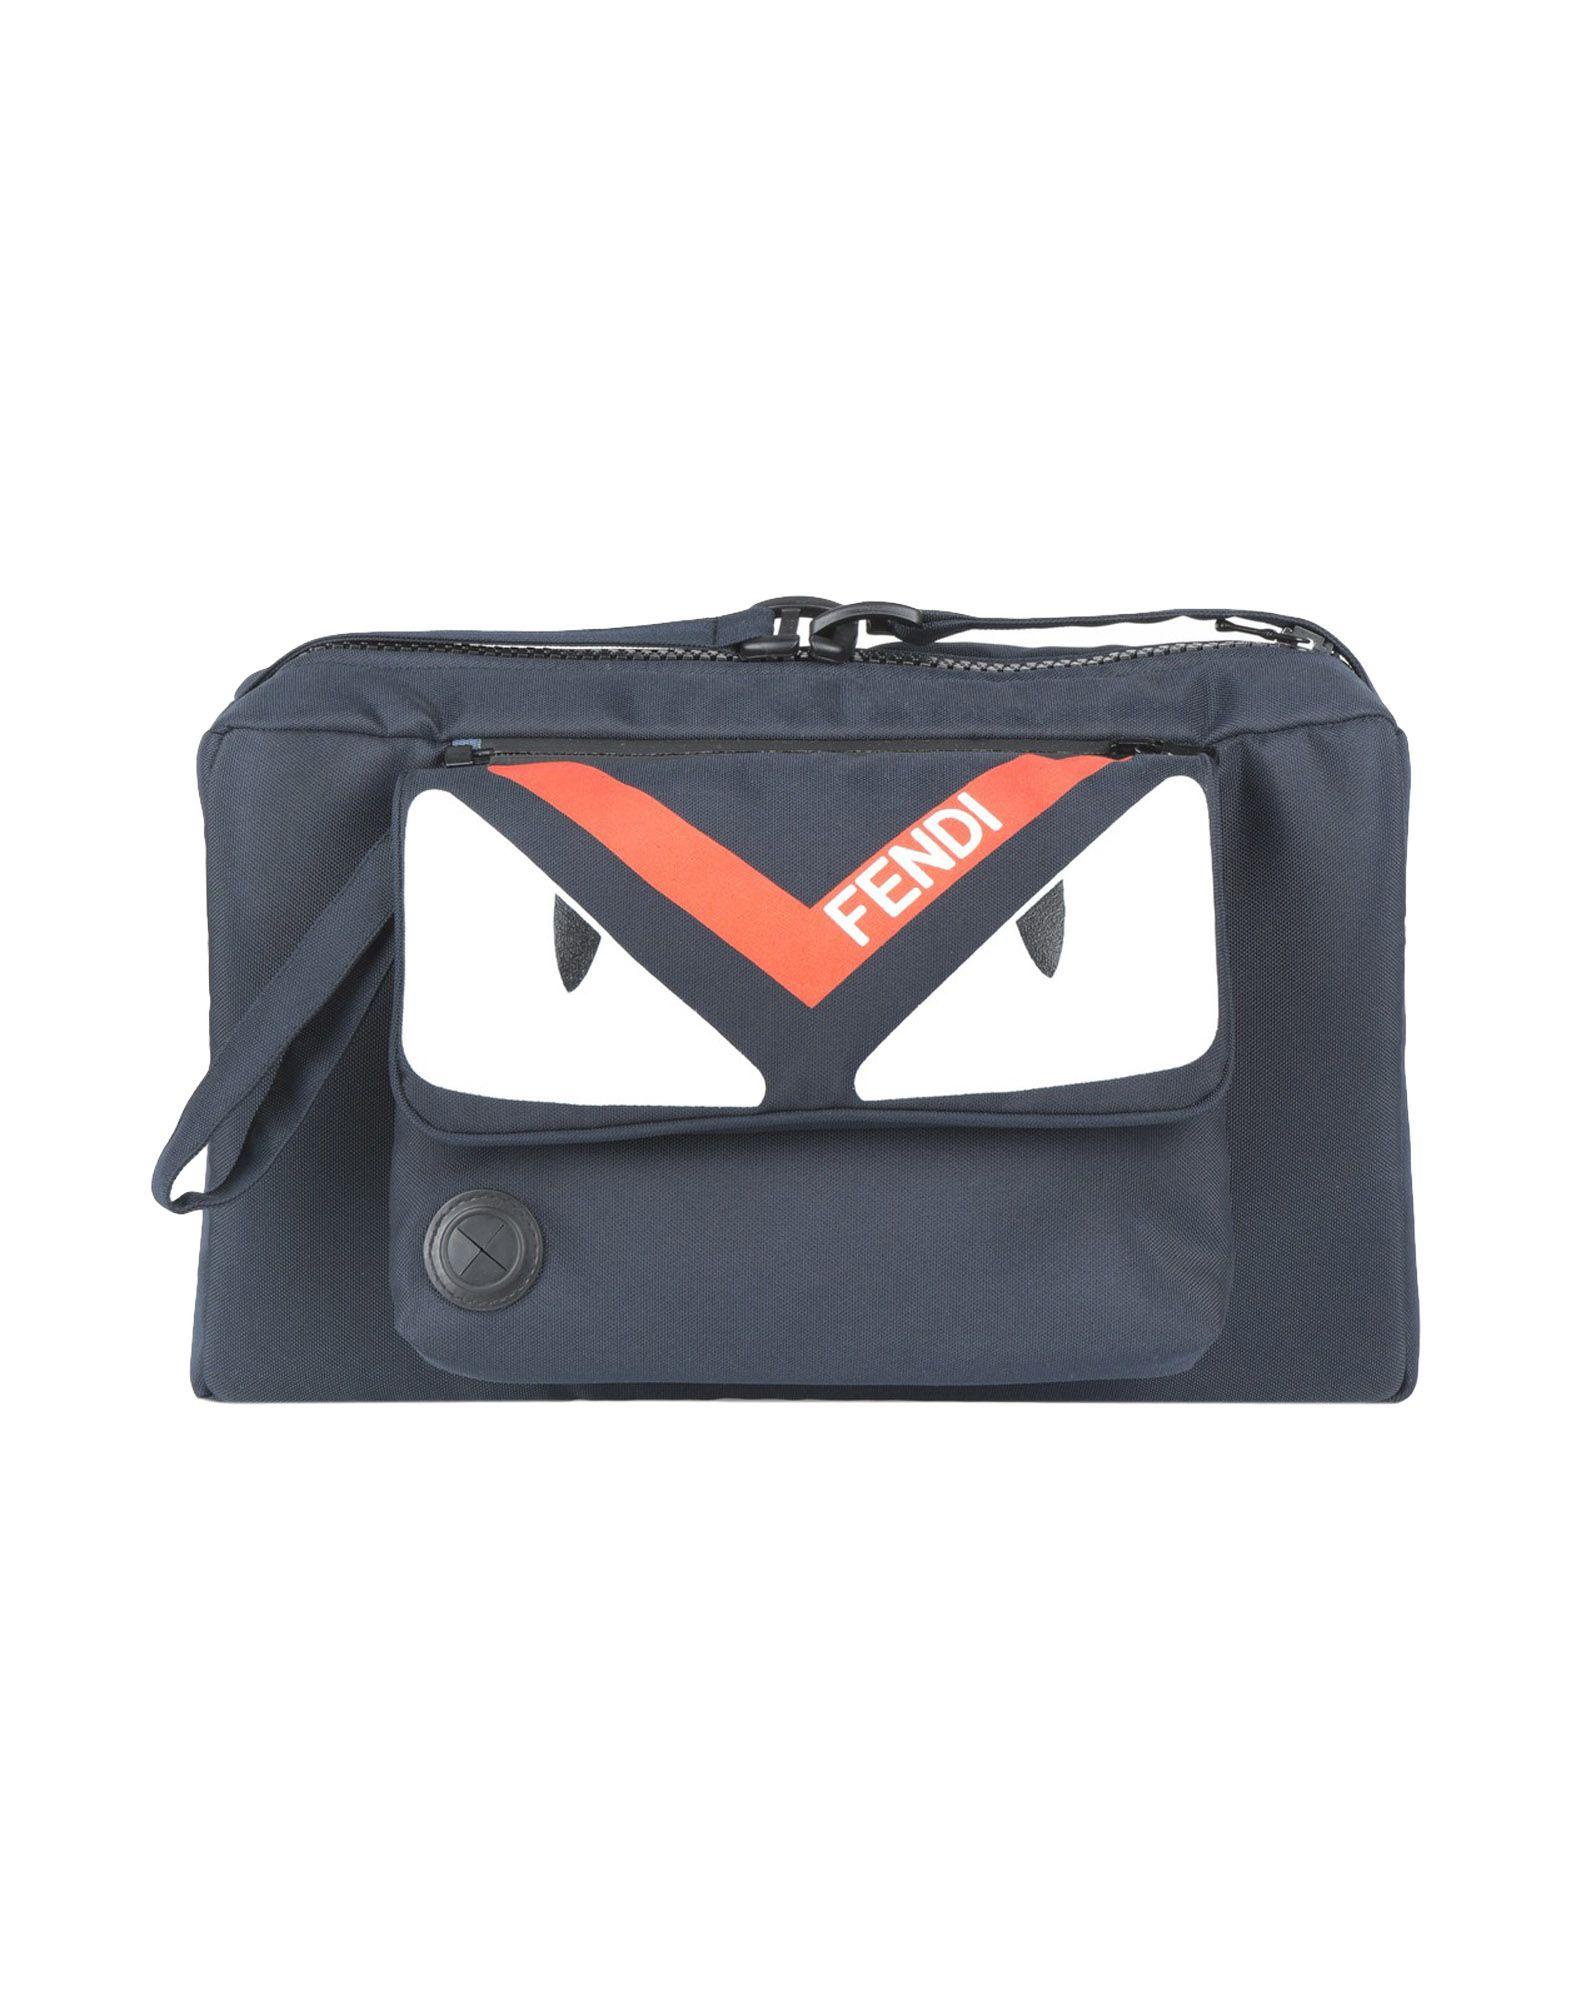 8ed26a4762b0 Moschino сумка для мам guiwebtbullfolk.tk